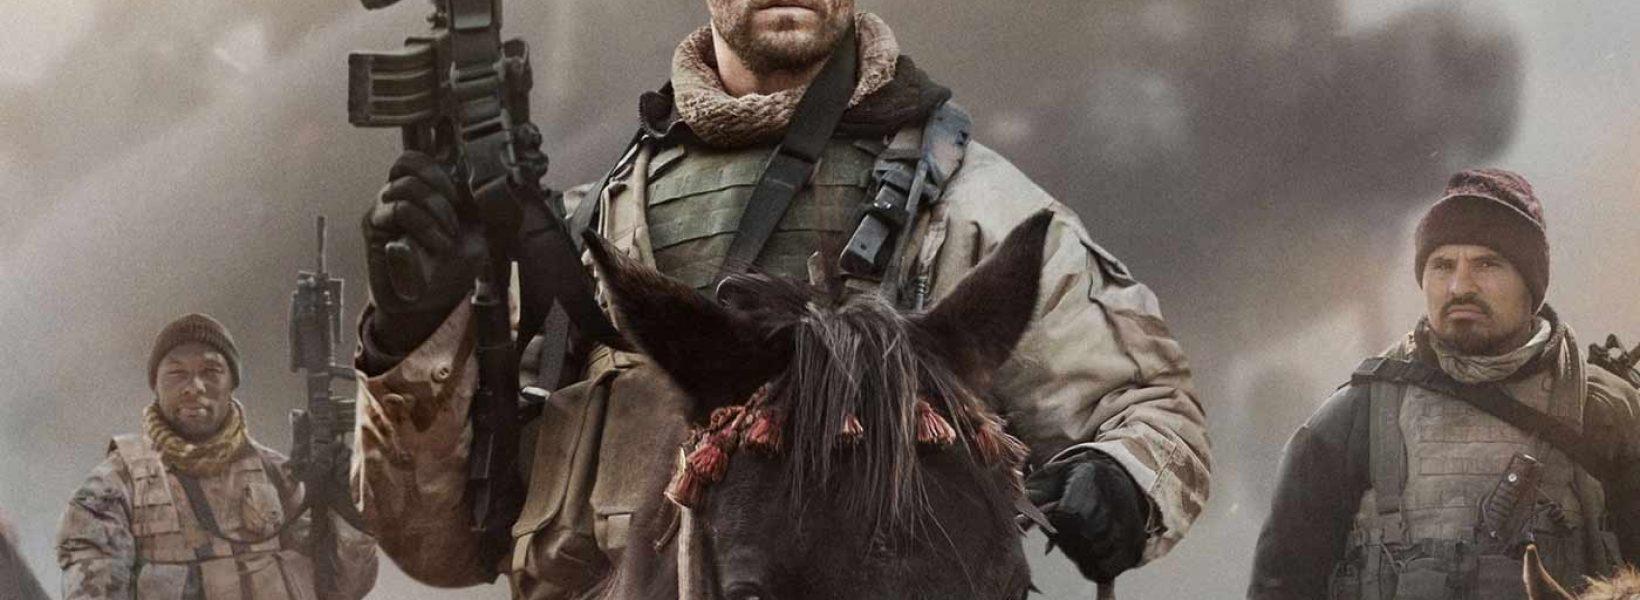 Action Series & Movies - Next Flicks